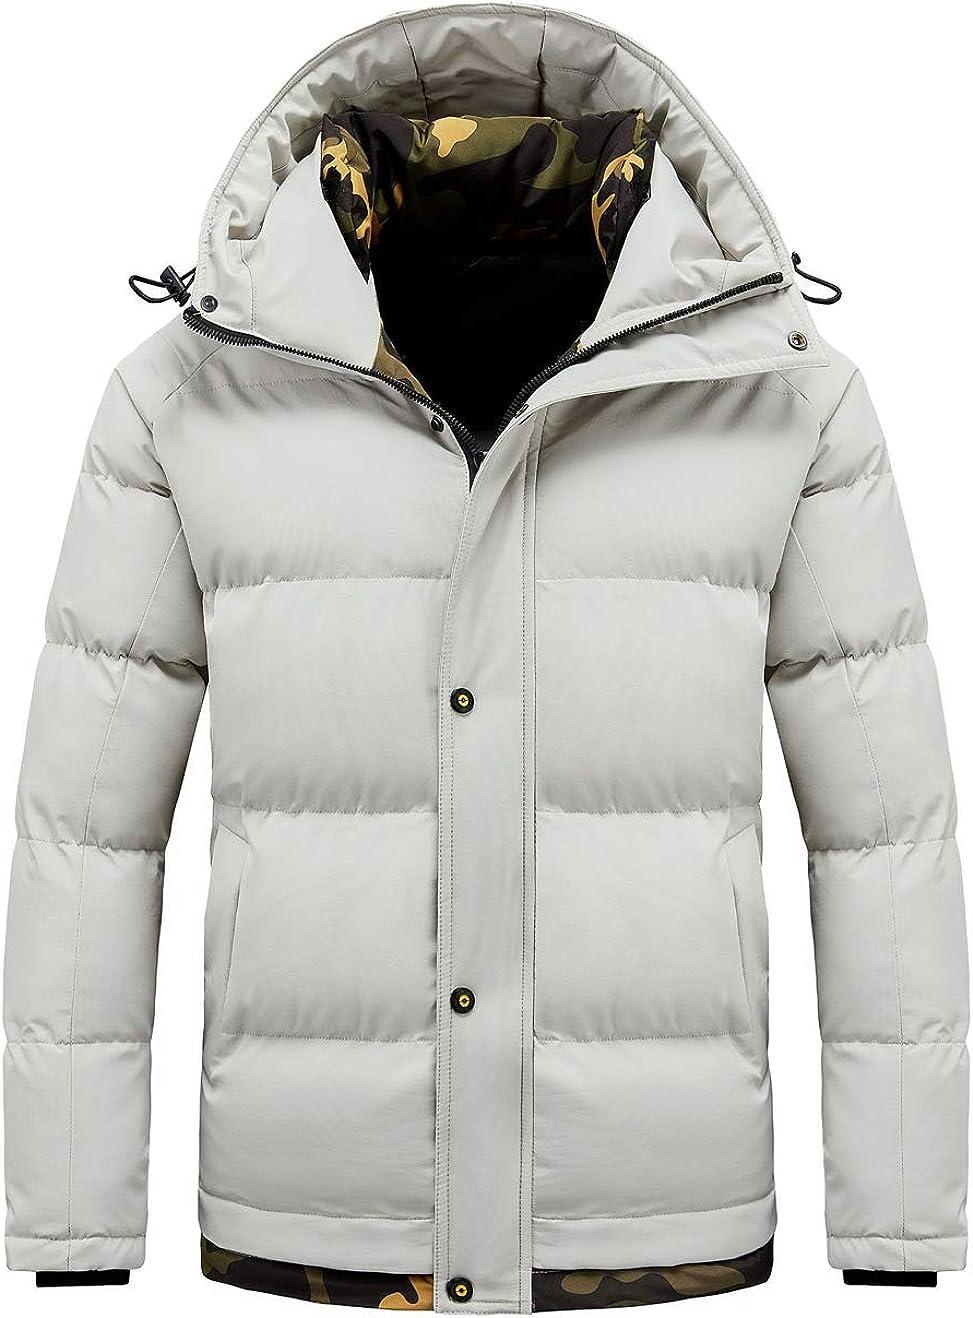 chouyatou Men's Active Camo Spliced Padded Hooded Winter Alternative Down Jacket